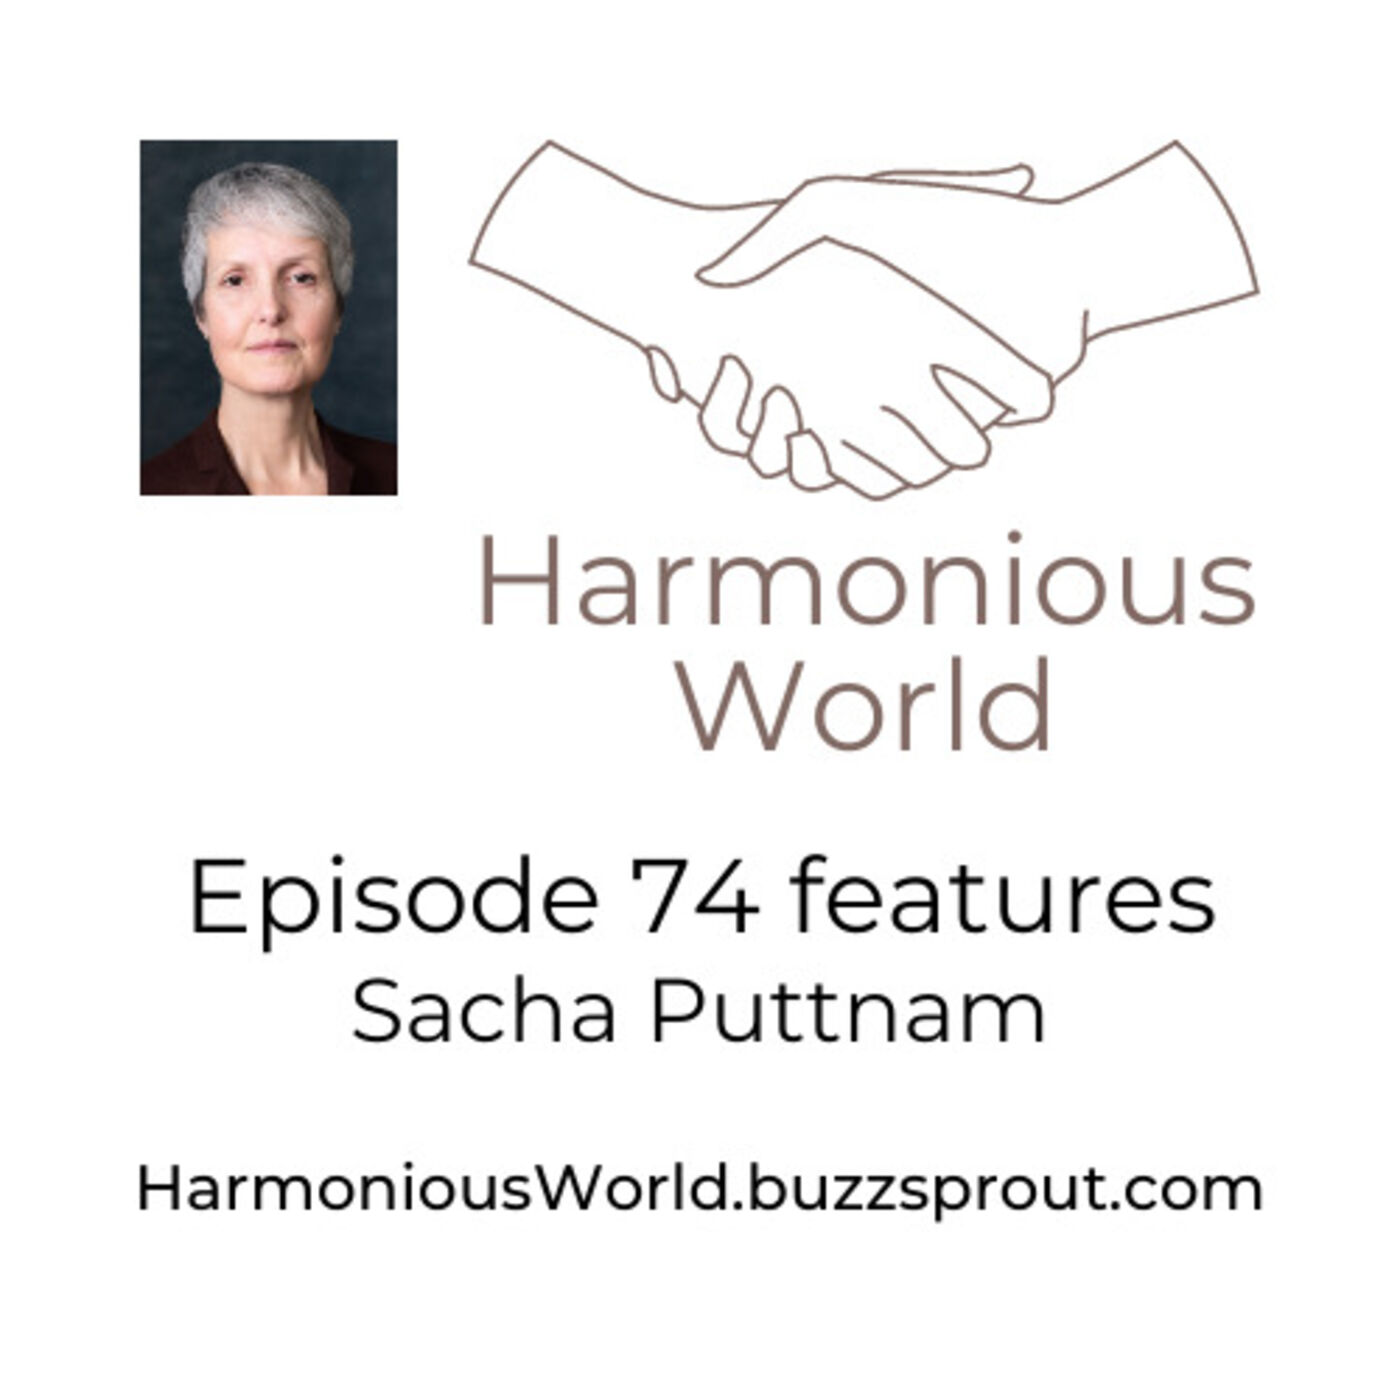 Sacha Puttnam